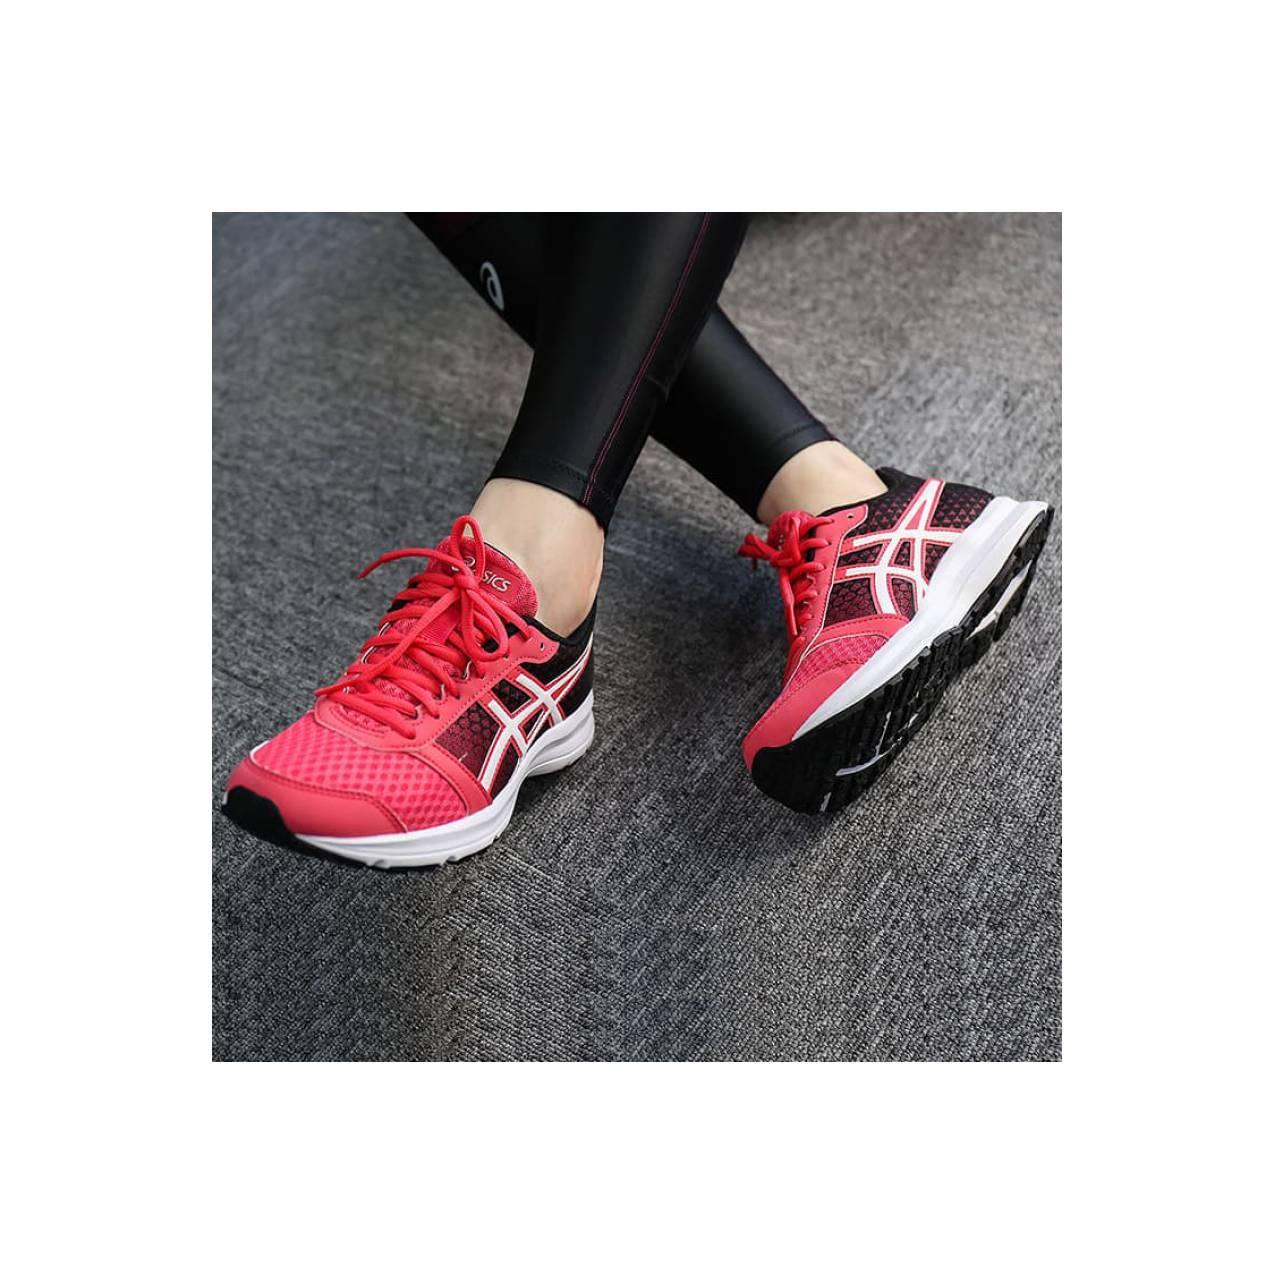 Sepatu Running ASICS Patriot 8 Original (Women) - Merah Muda 32491a3316